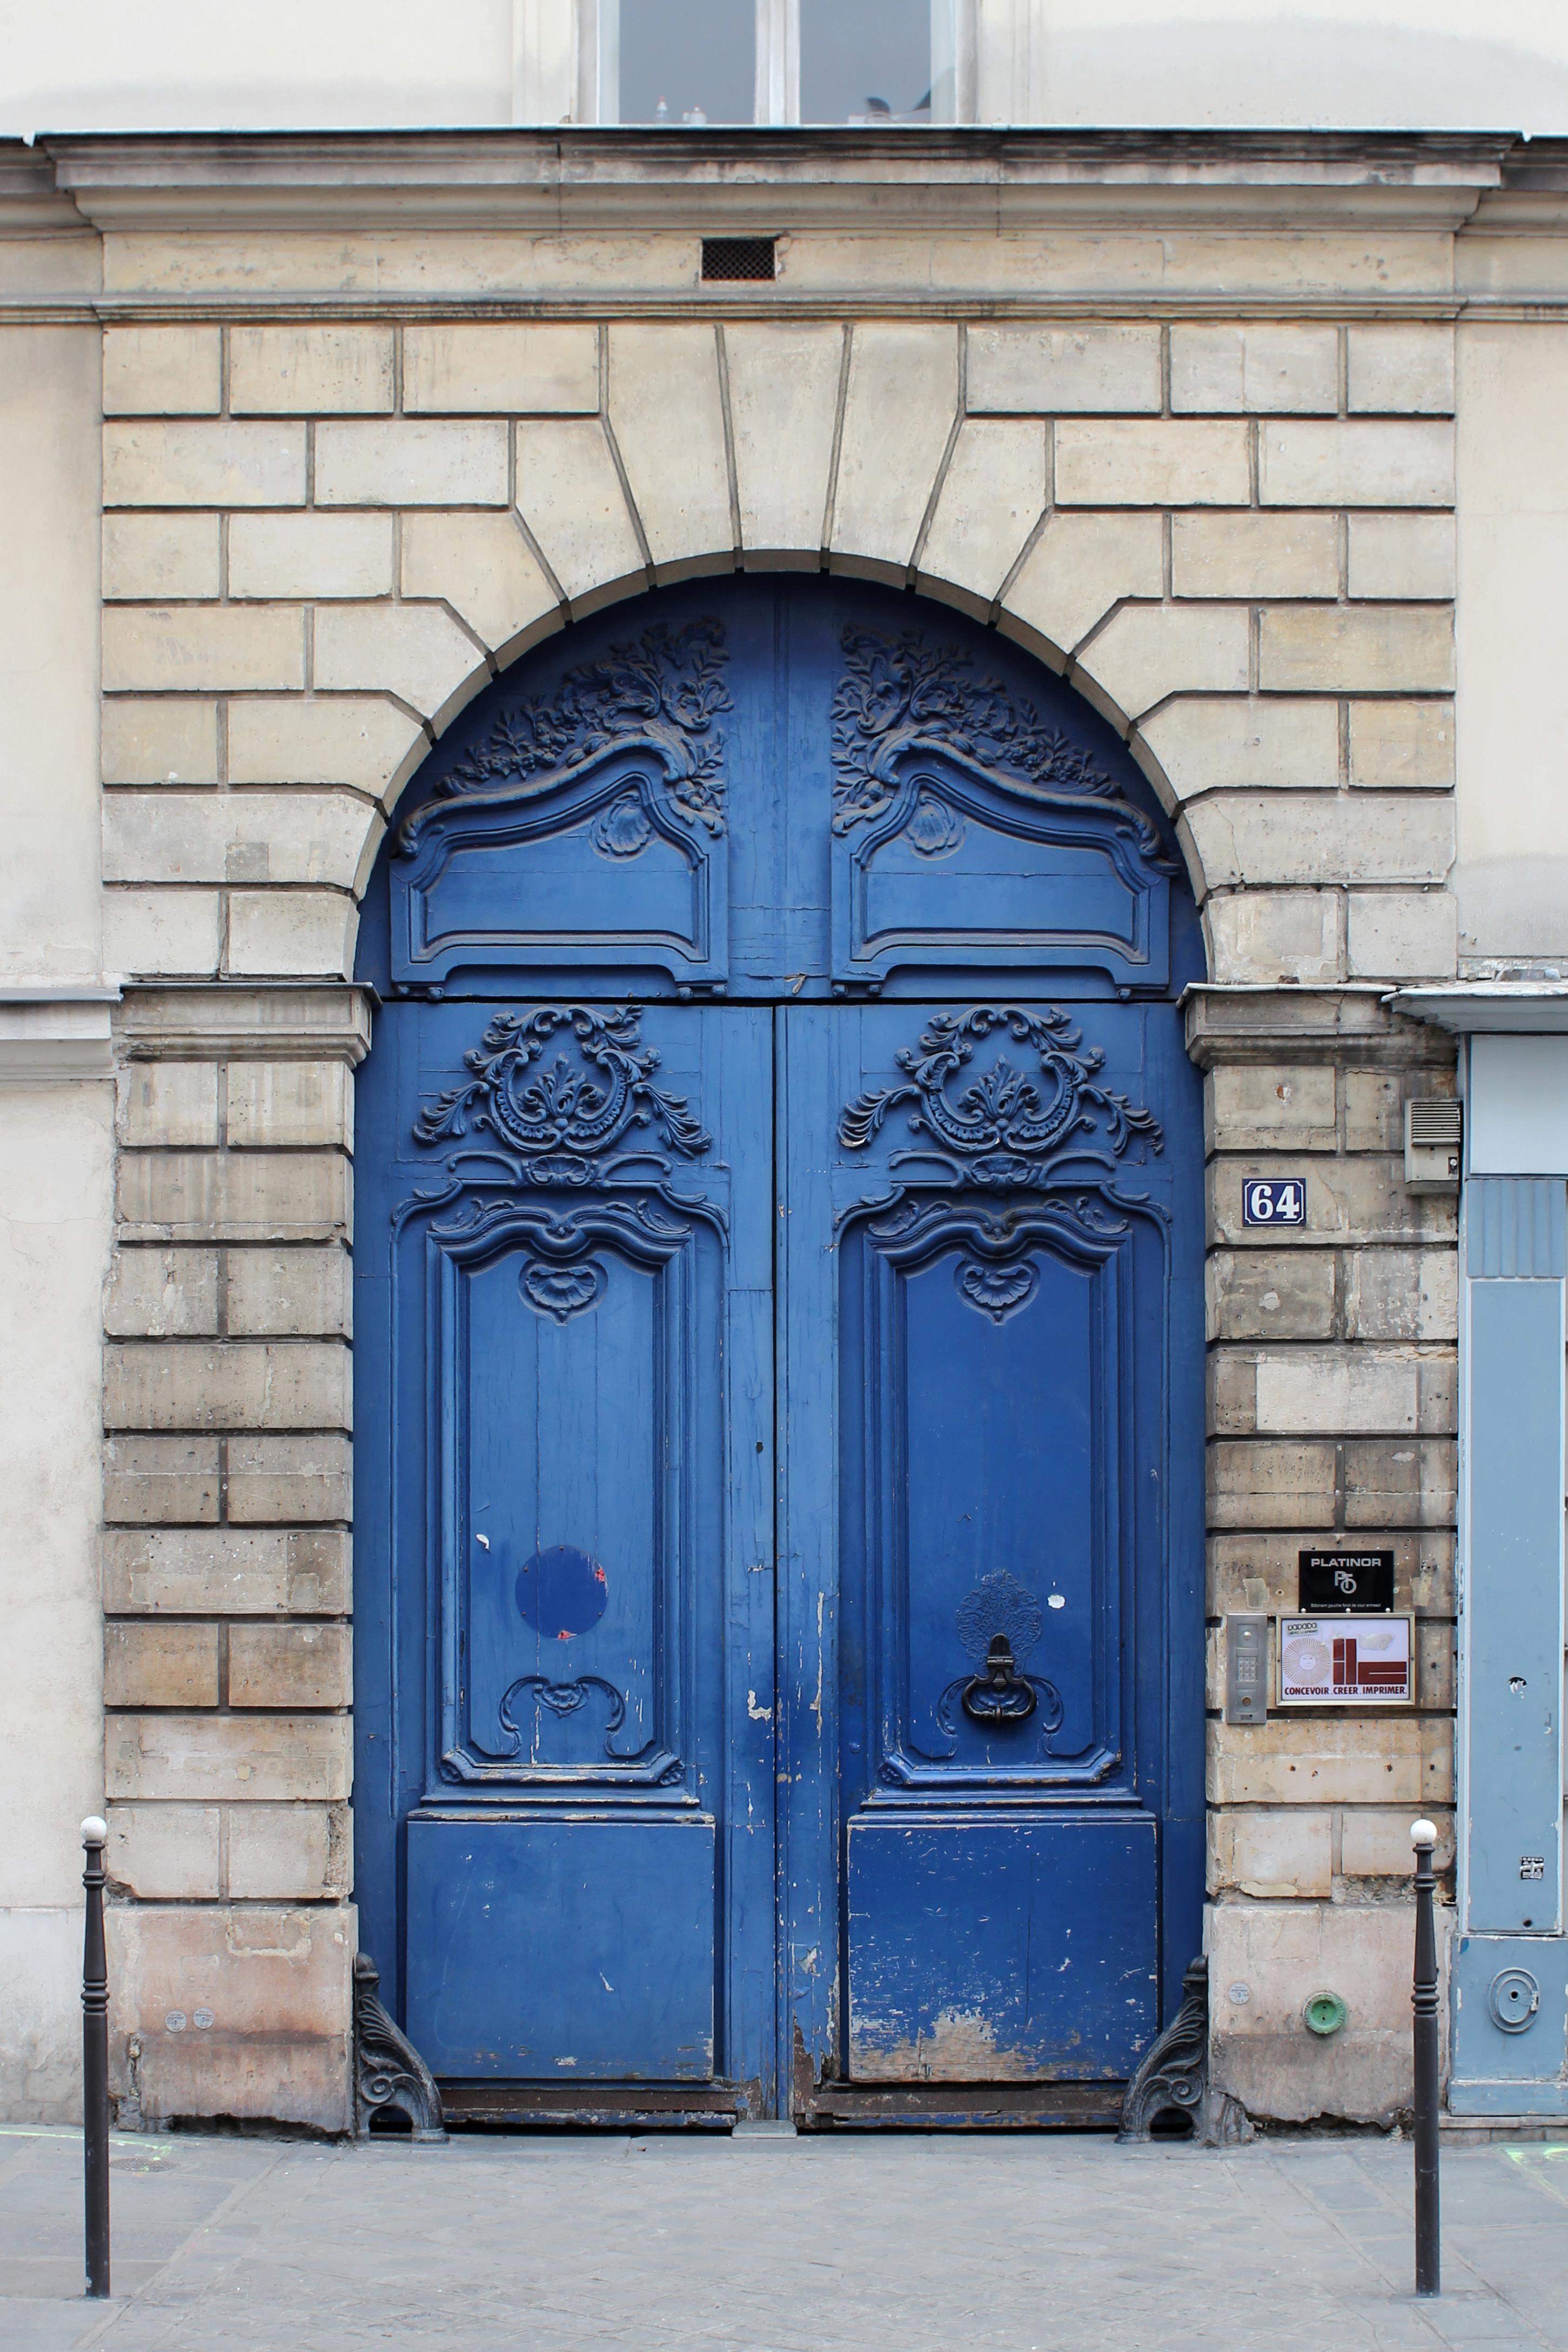 file rue de turenne paris num ro 64 wikimedia commons. Black Bedroom Furniture Sets. Home Design Ideas